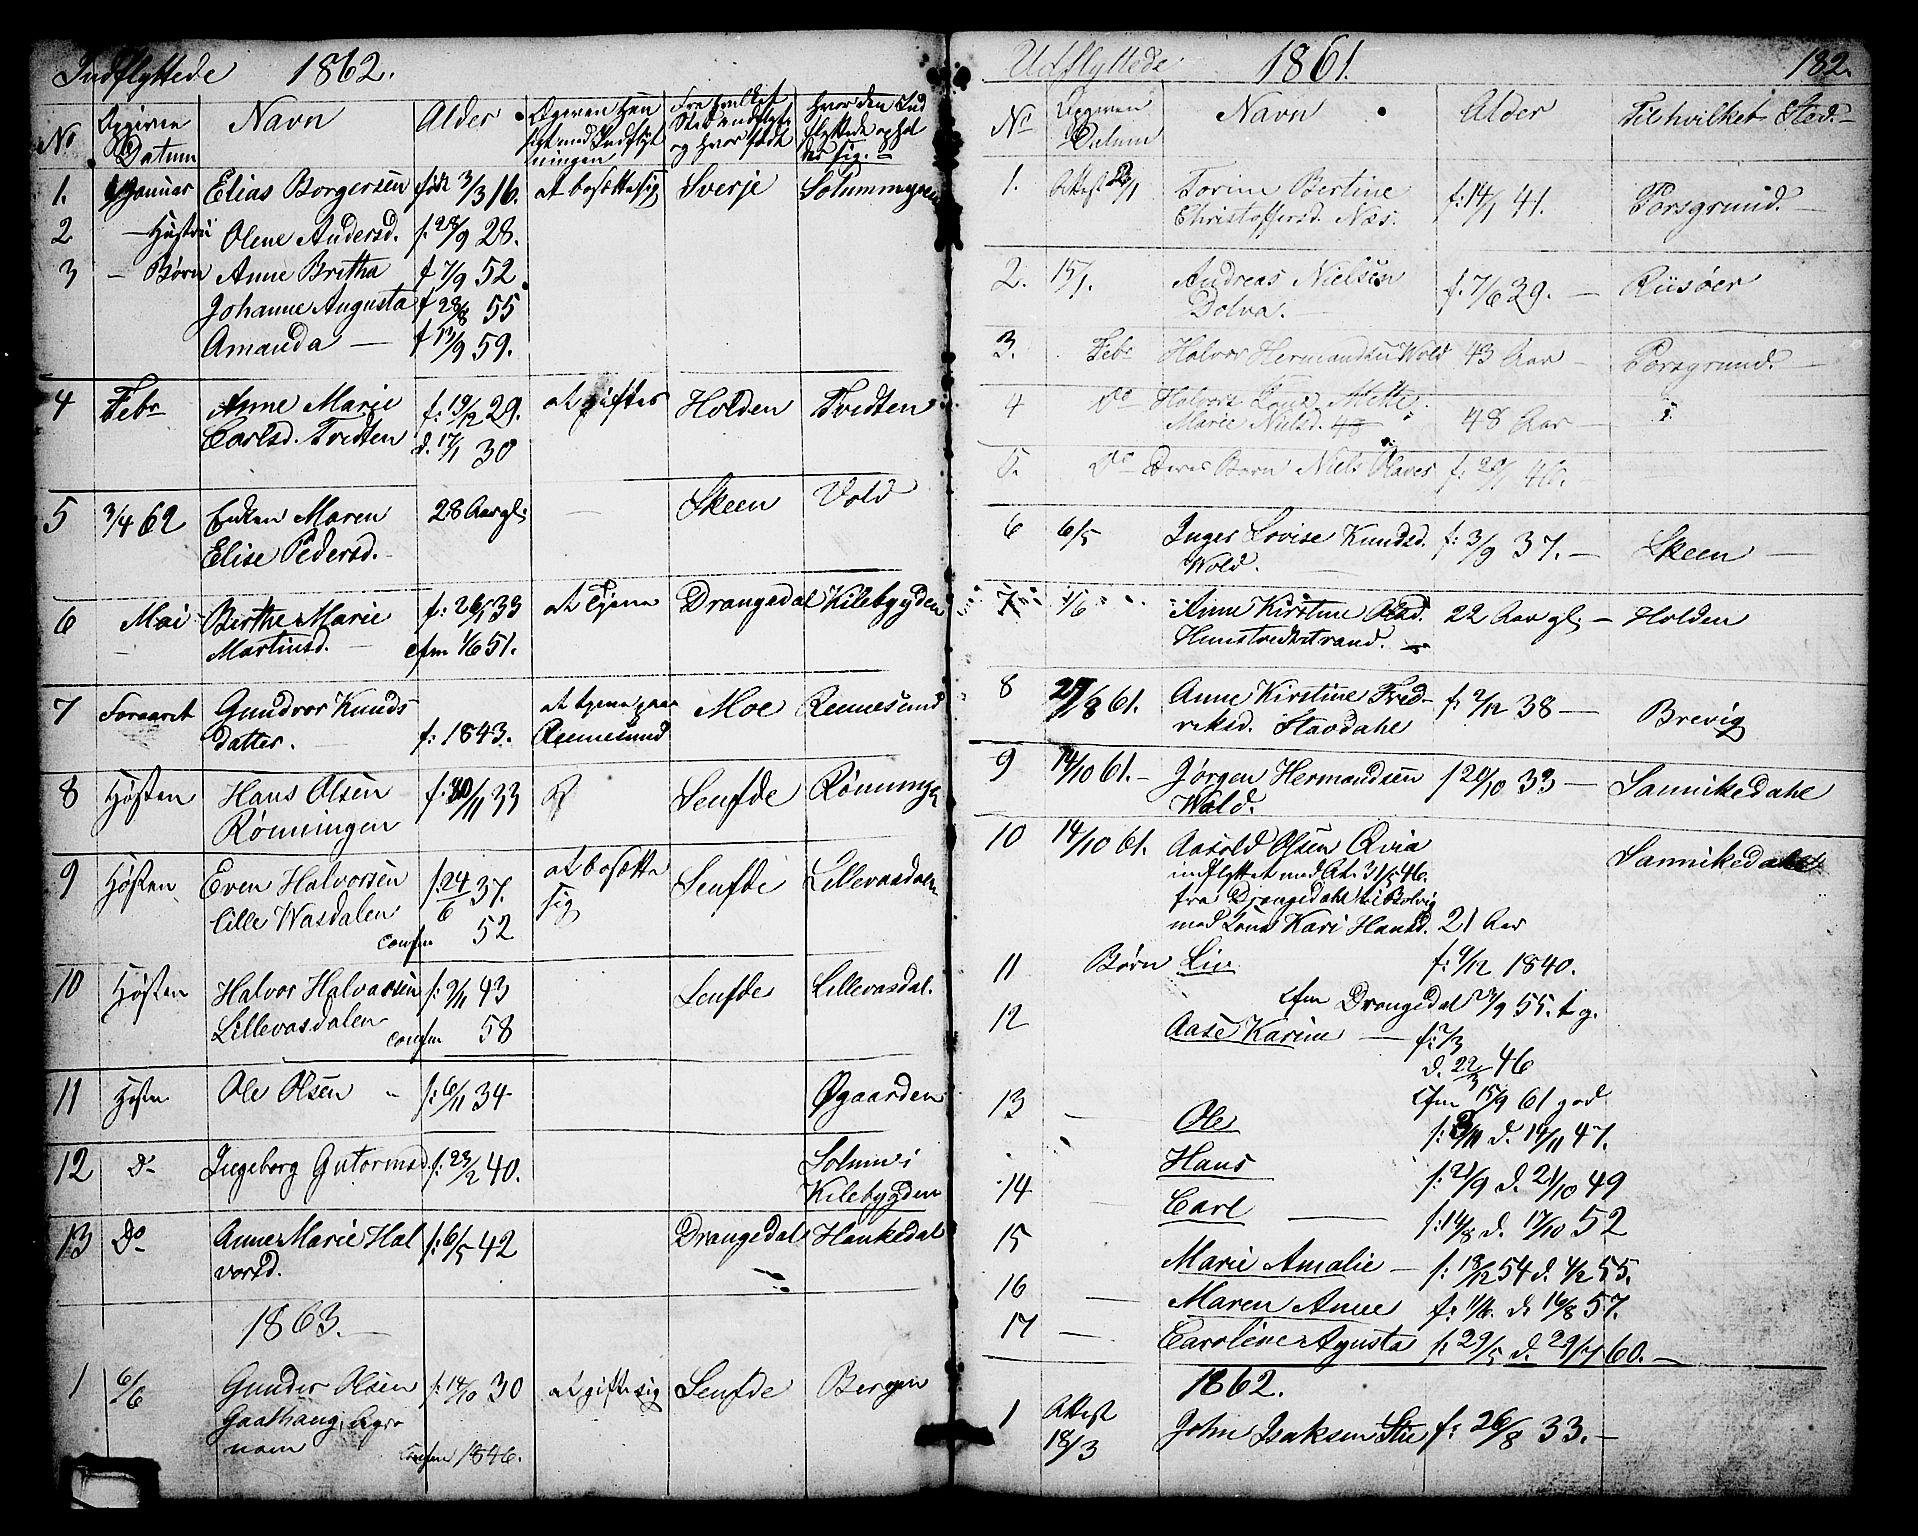 SAKO, Solum kirkebøker, G/Gb/L0002: Klokkerbok nr. II 2, 1859-1879, s. 182